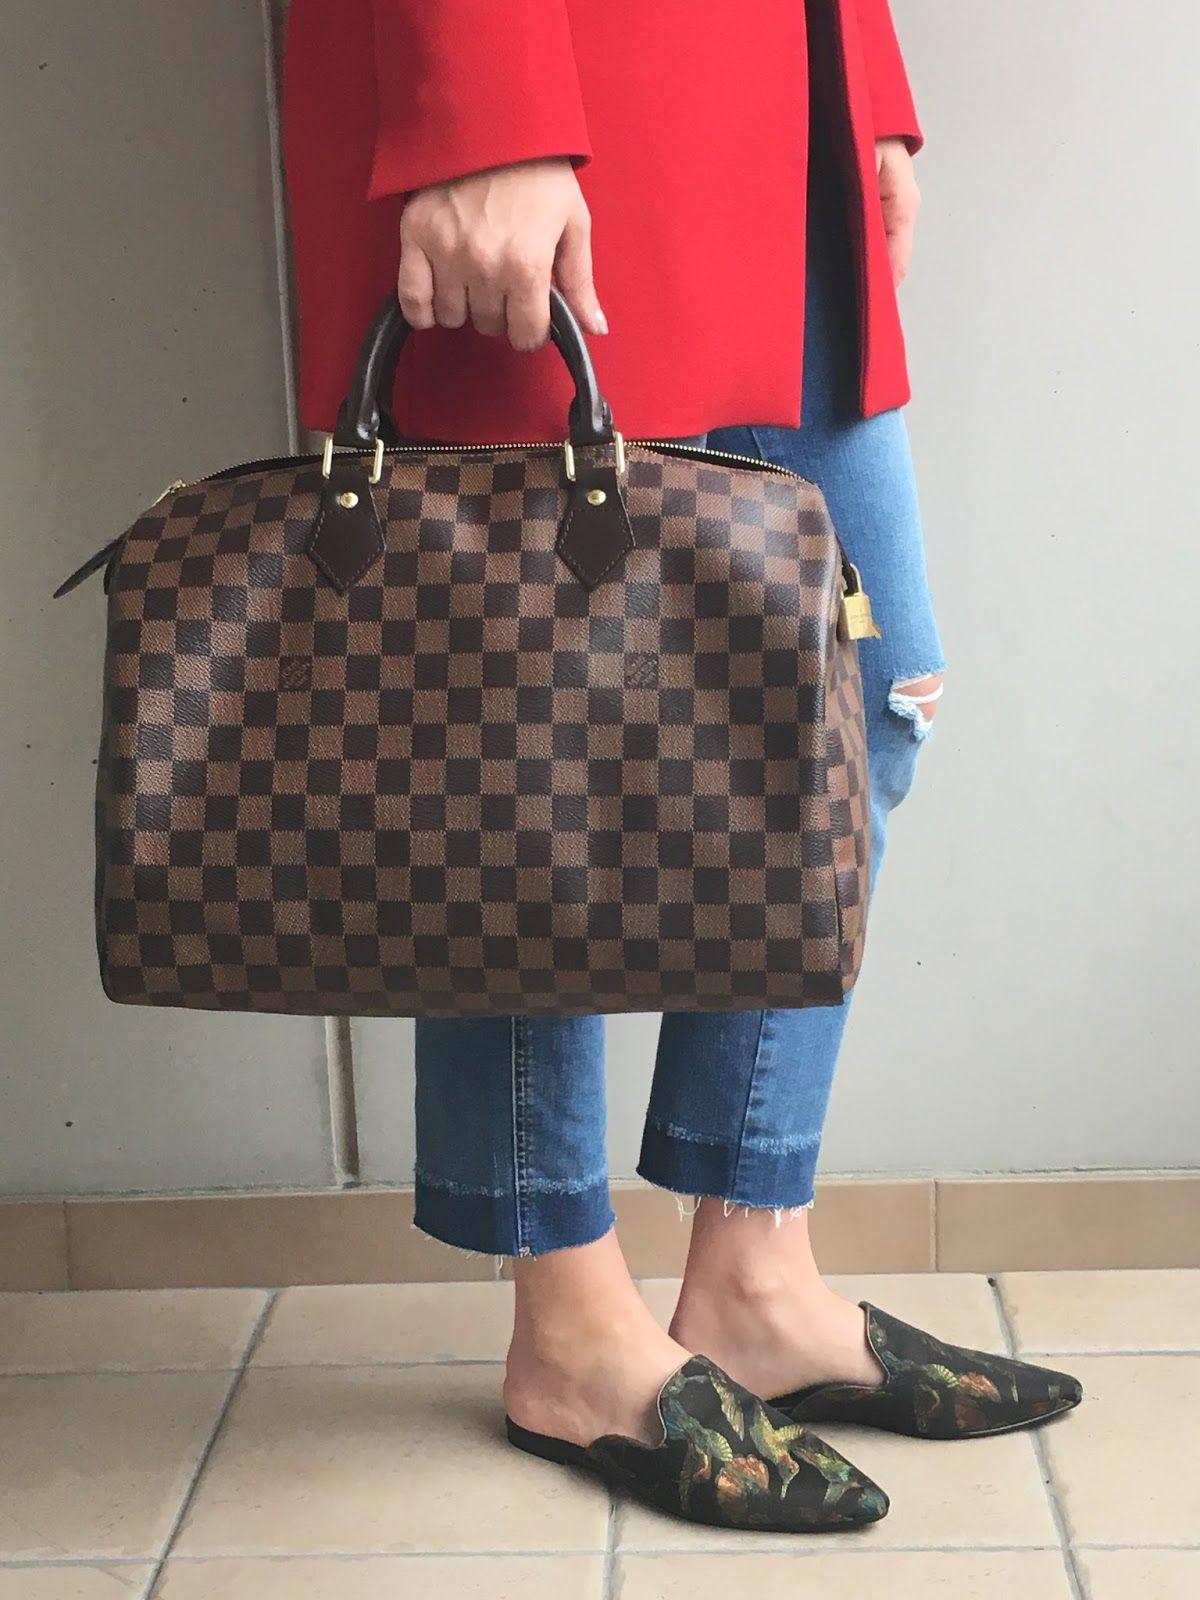 961209bda2 Louis Vuitton Speedy 35 Review